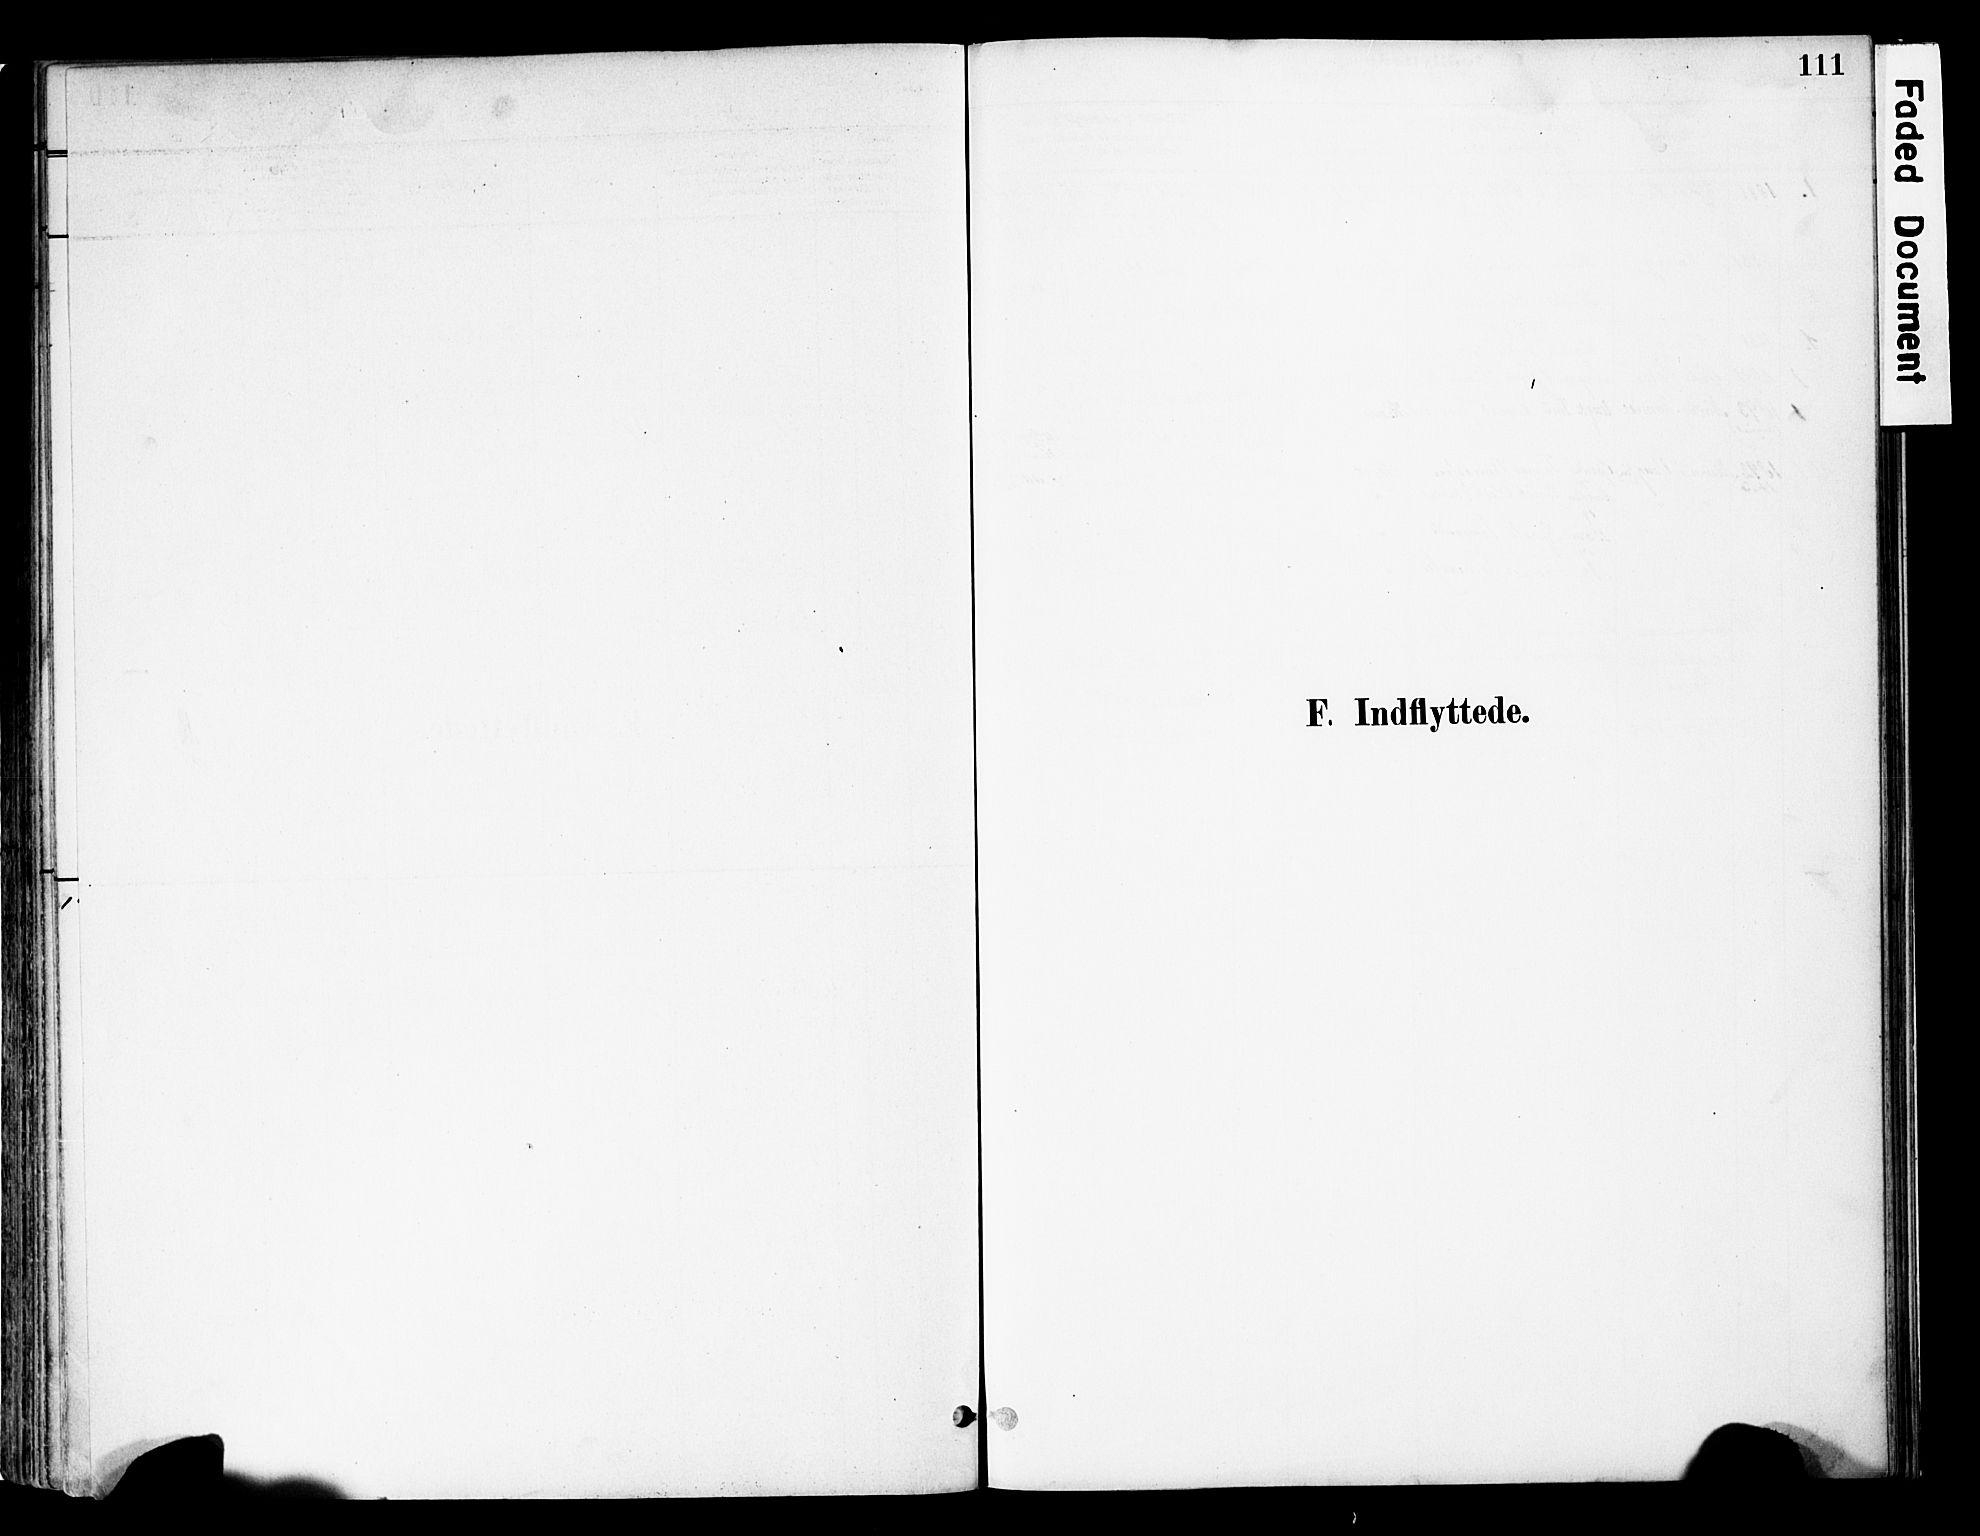 SAH, Vestre Slidre prestekontor, Ministerialbok nr. 5, 1881-1912, s. 111